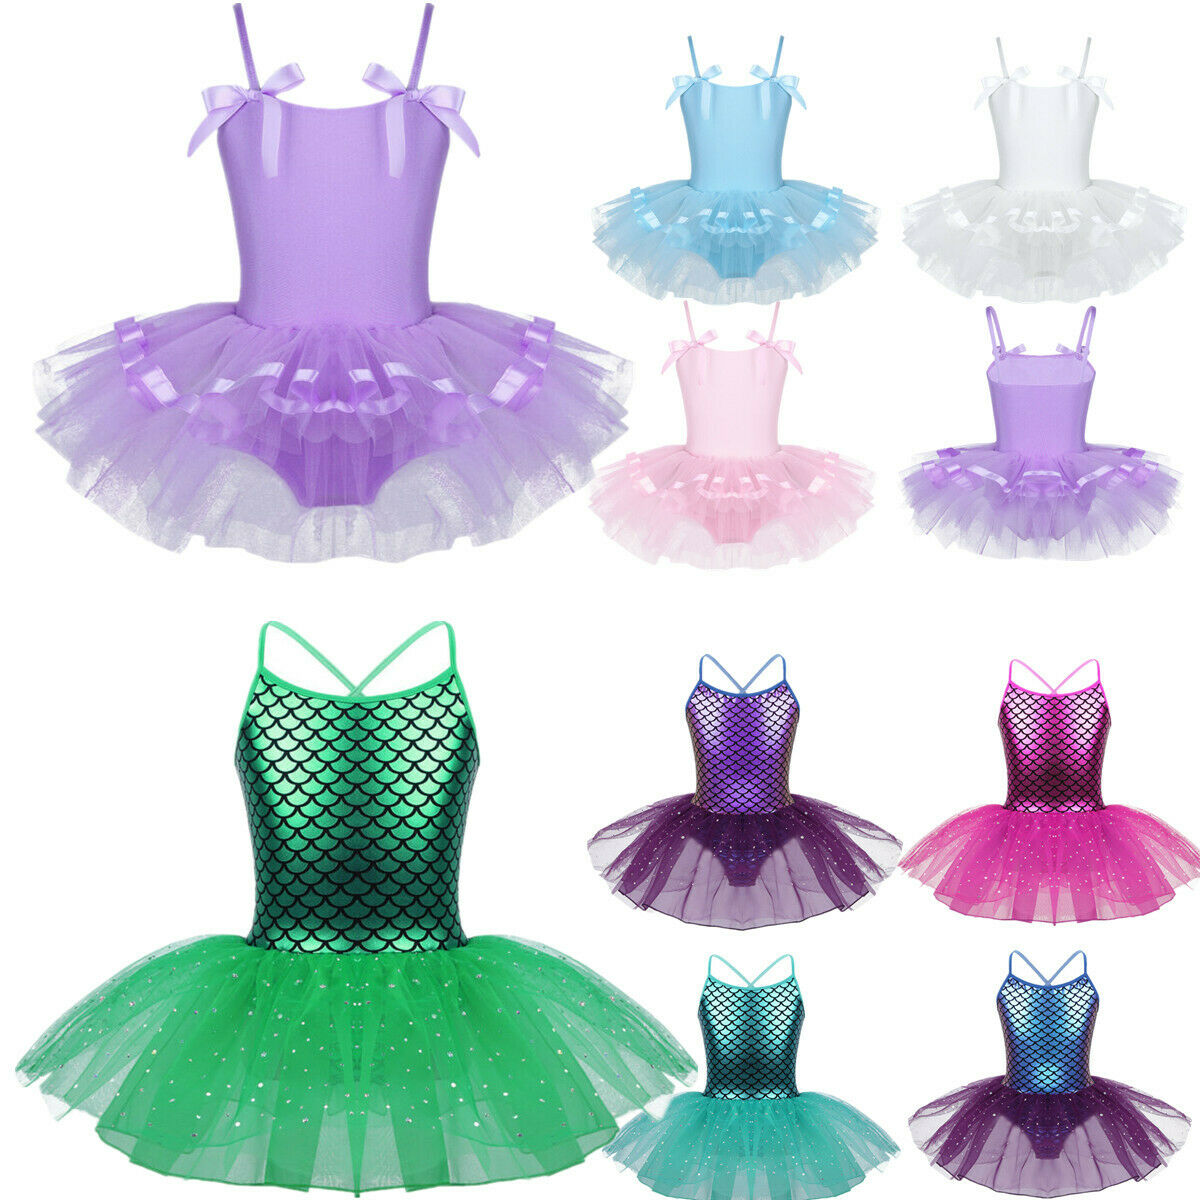 Kids Girls Mermaid Ballet Dance Tutu Dress Glitter Gymnastic Leotard Costume